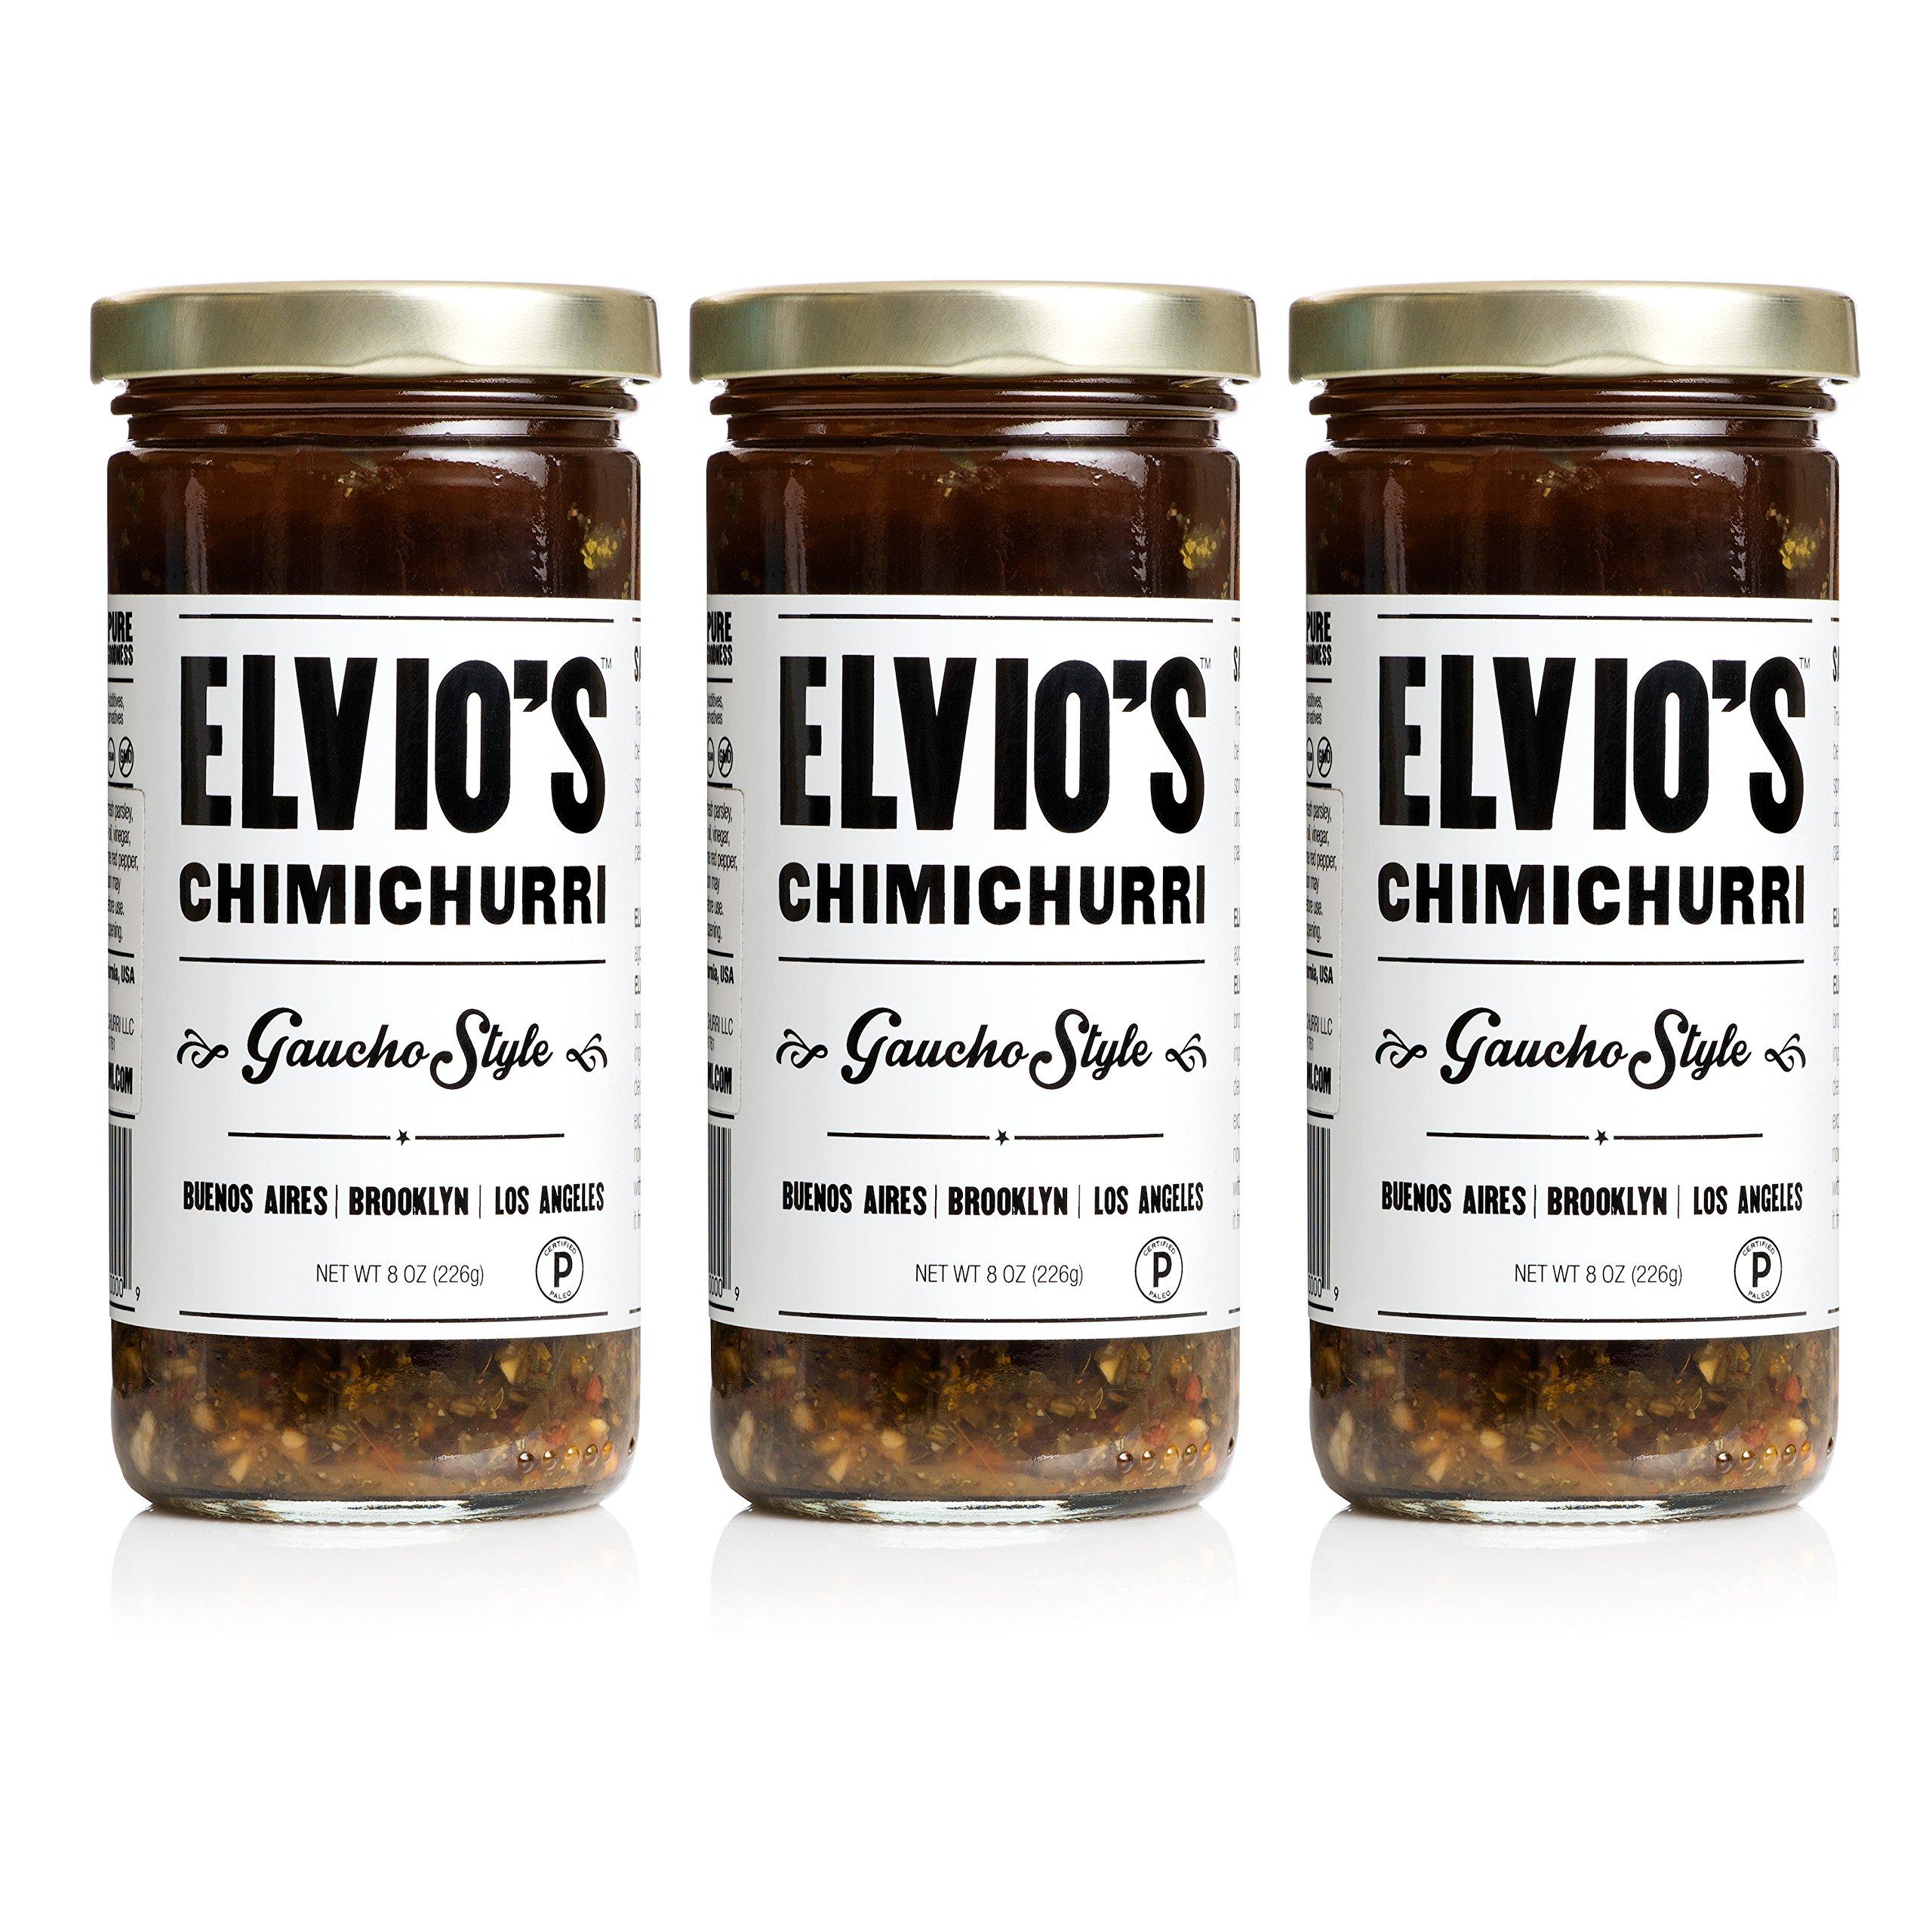 ELVIO'S CHIMICHURRI -Gaucho Style Chimichurri Sauce (8oz), Pack of 3